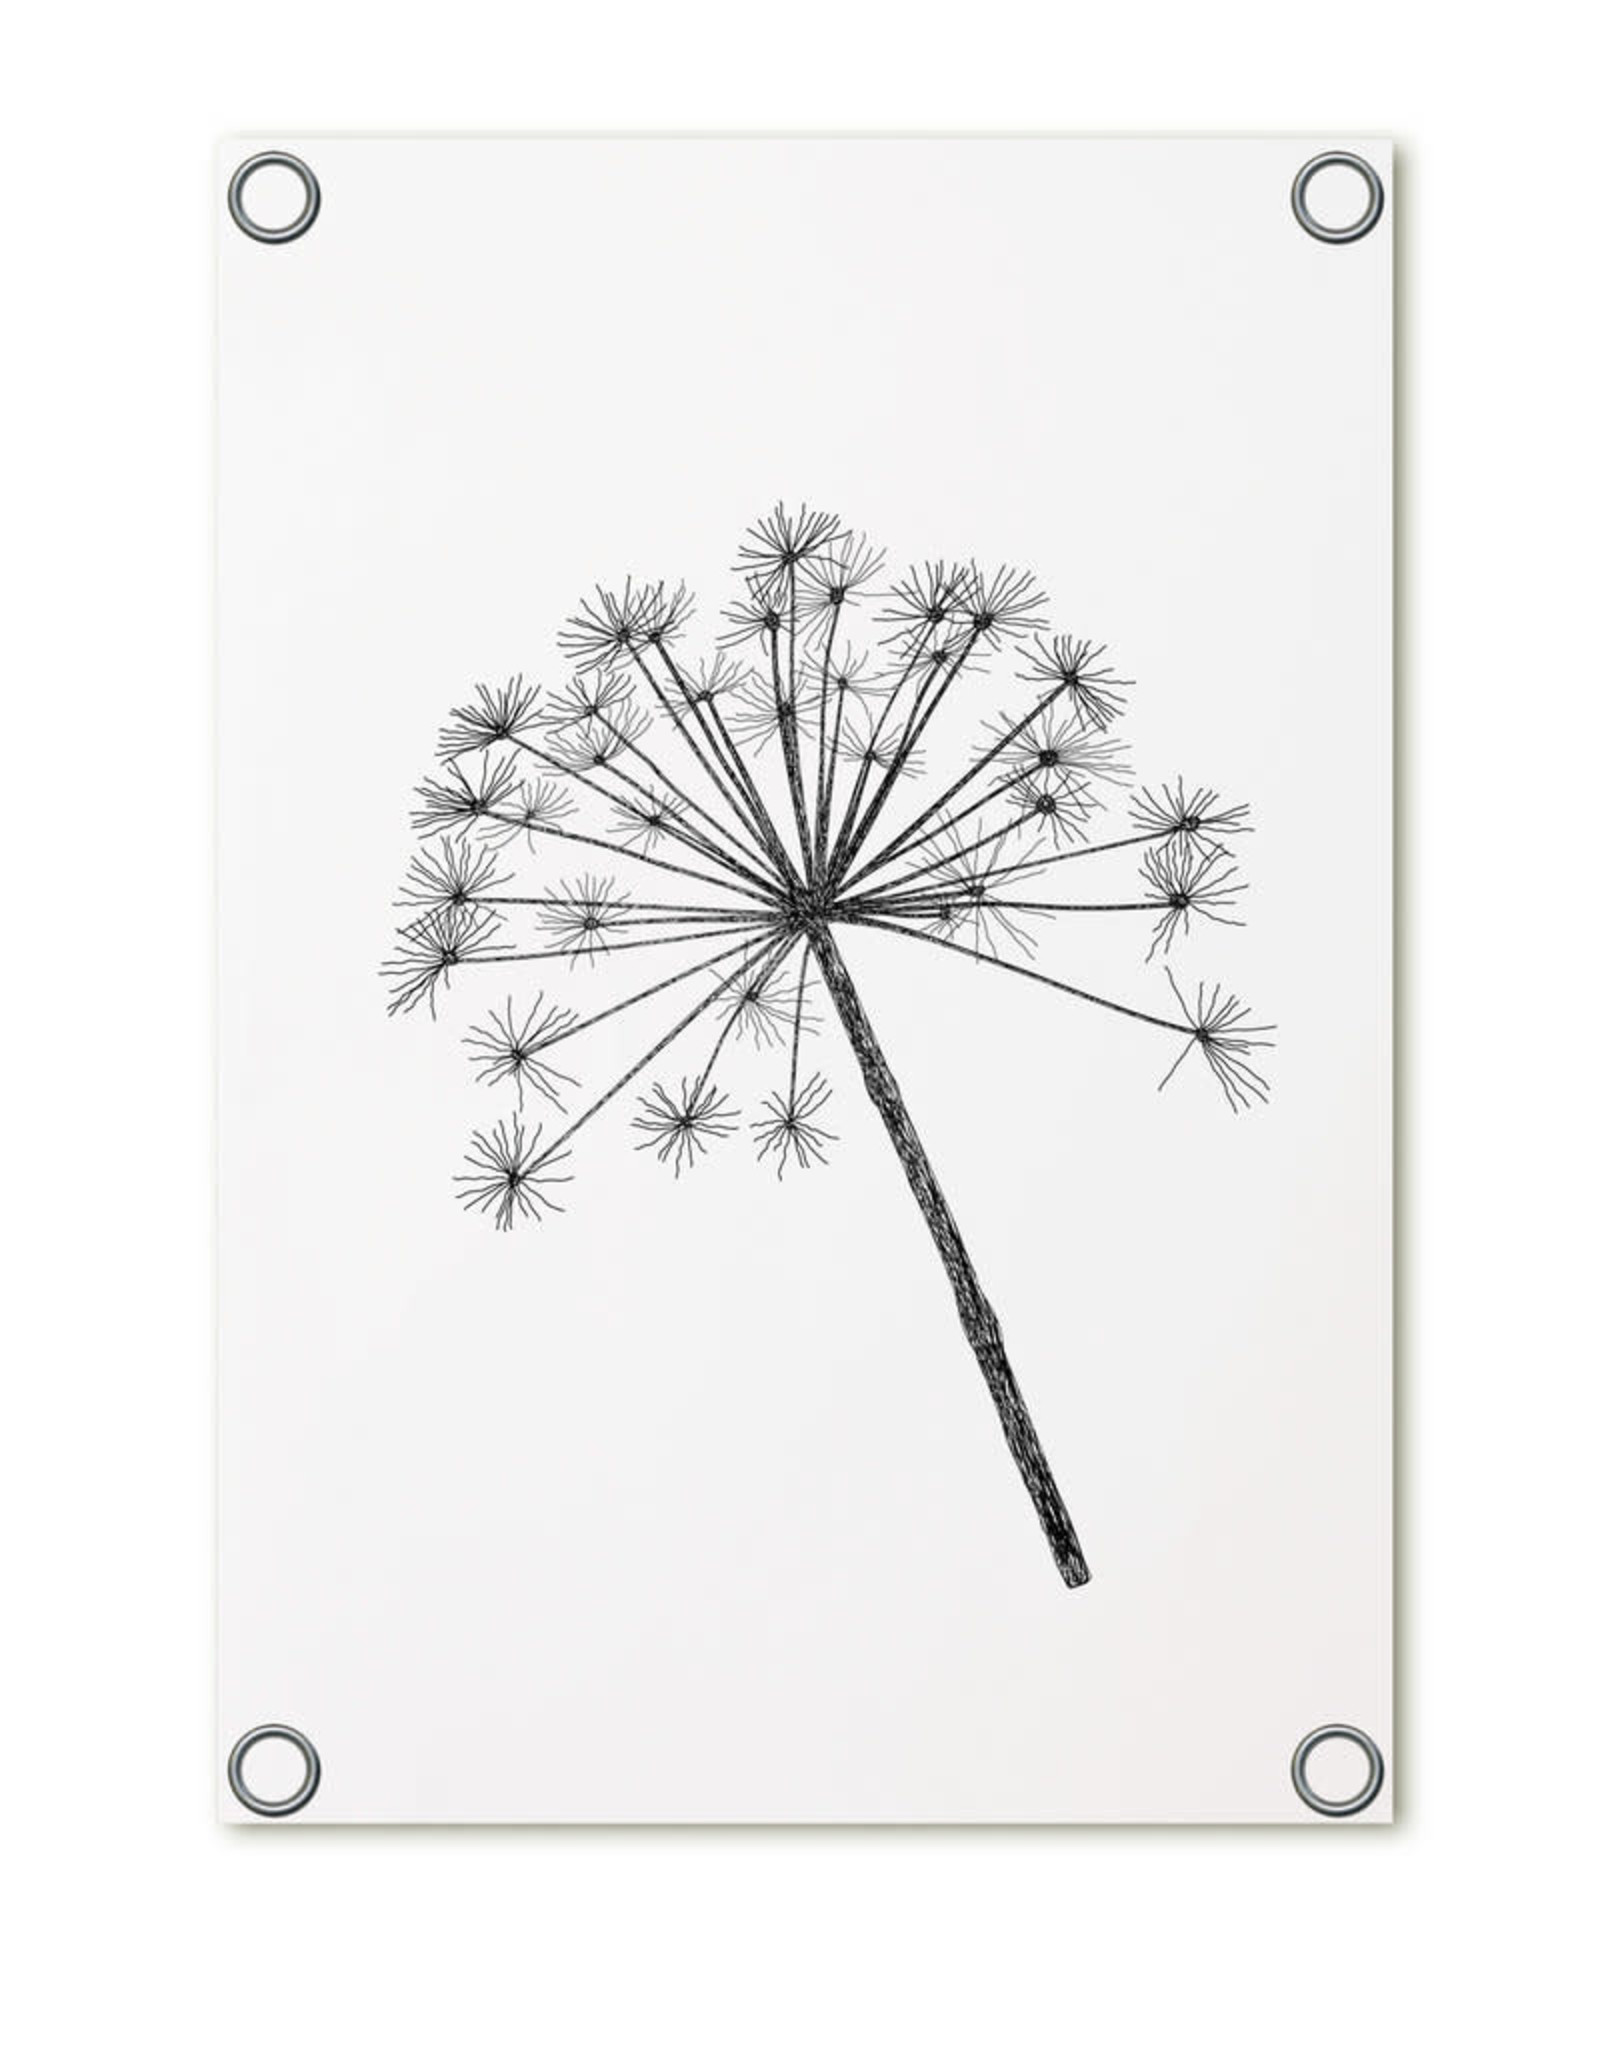 Tuinposter blaasbloem